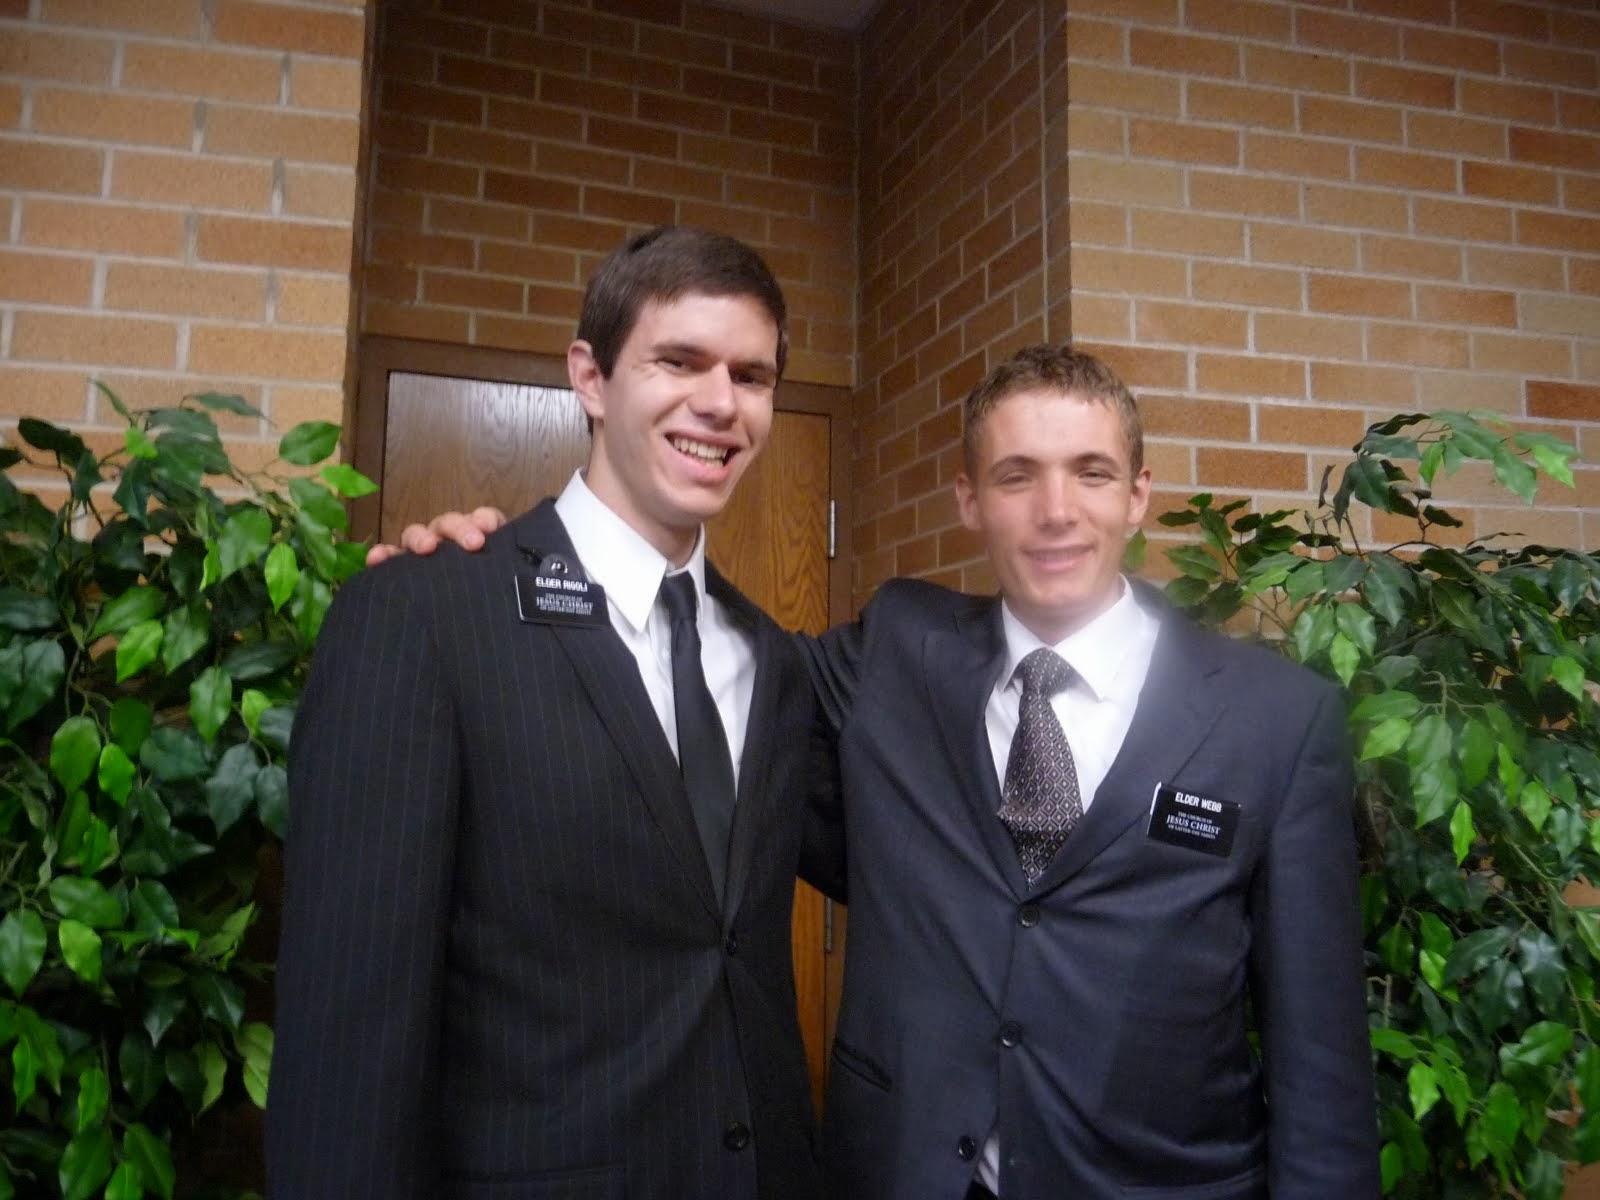 Elder Rigoli & Webb